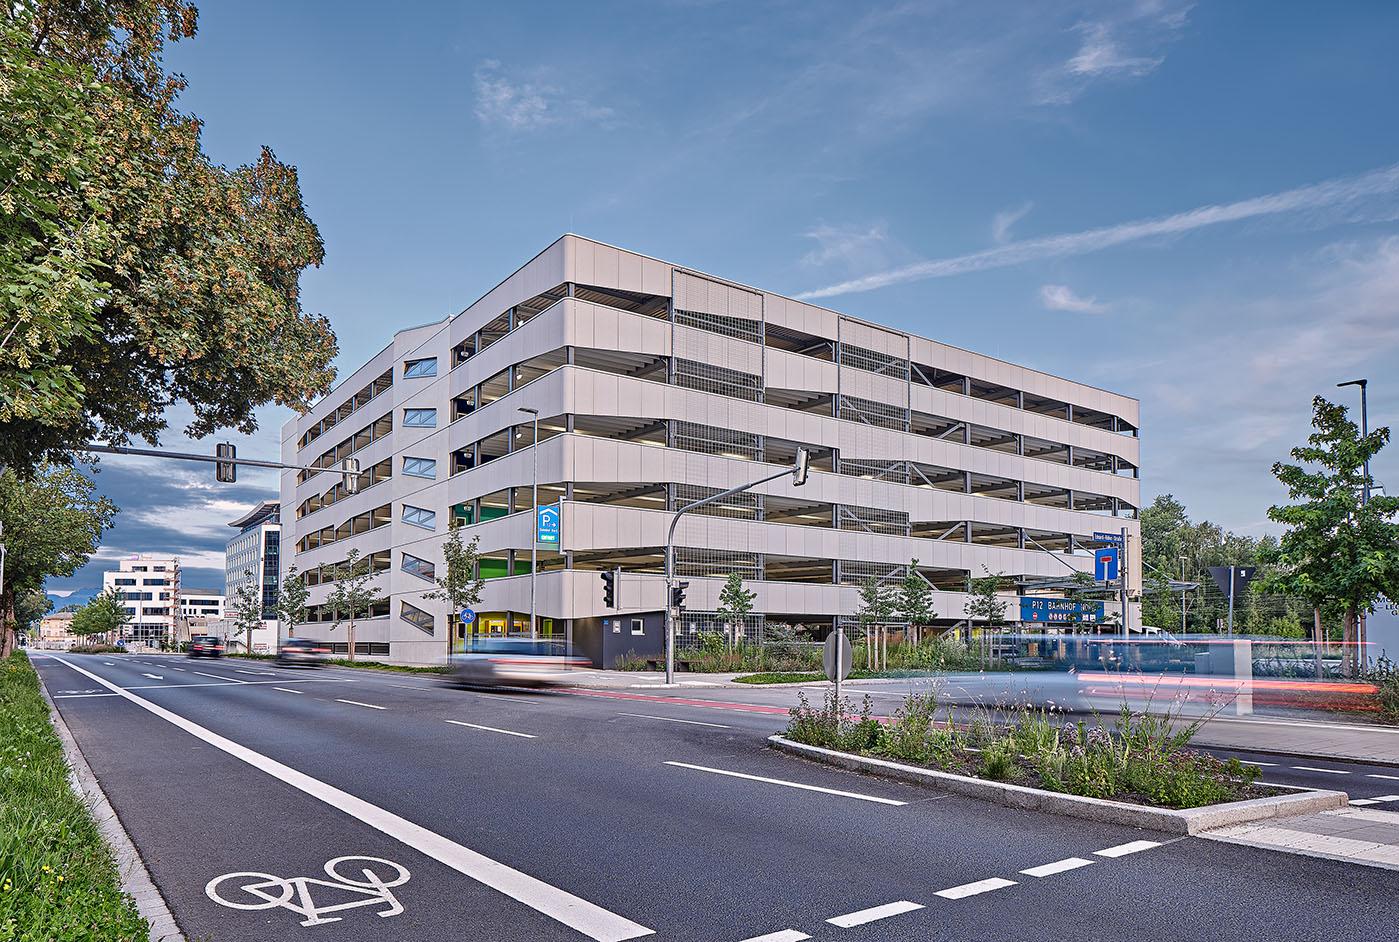 2020_07_20_HIB_Parkhaus_P12_Bahnhof_Nord_Rosenheim_NUM0127_1_0_rgb Kopie